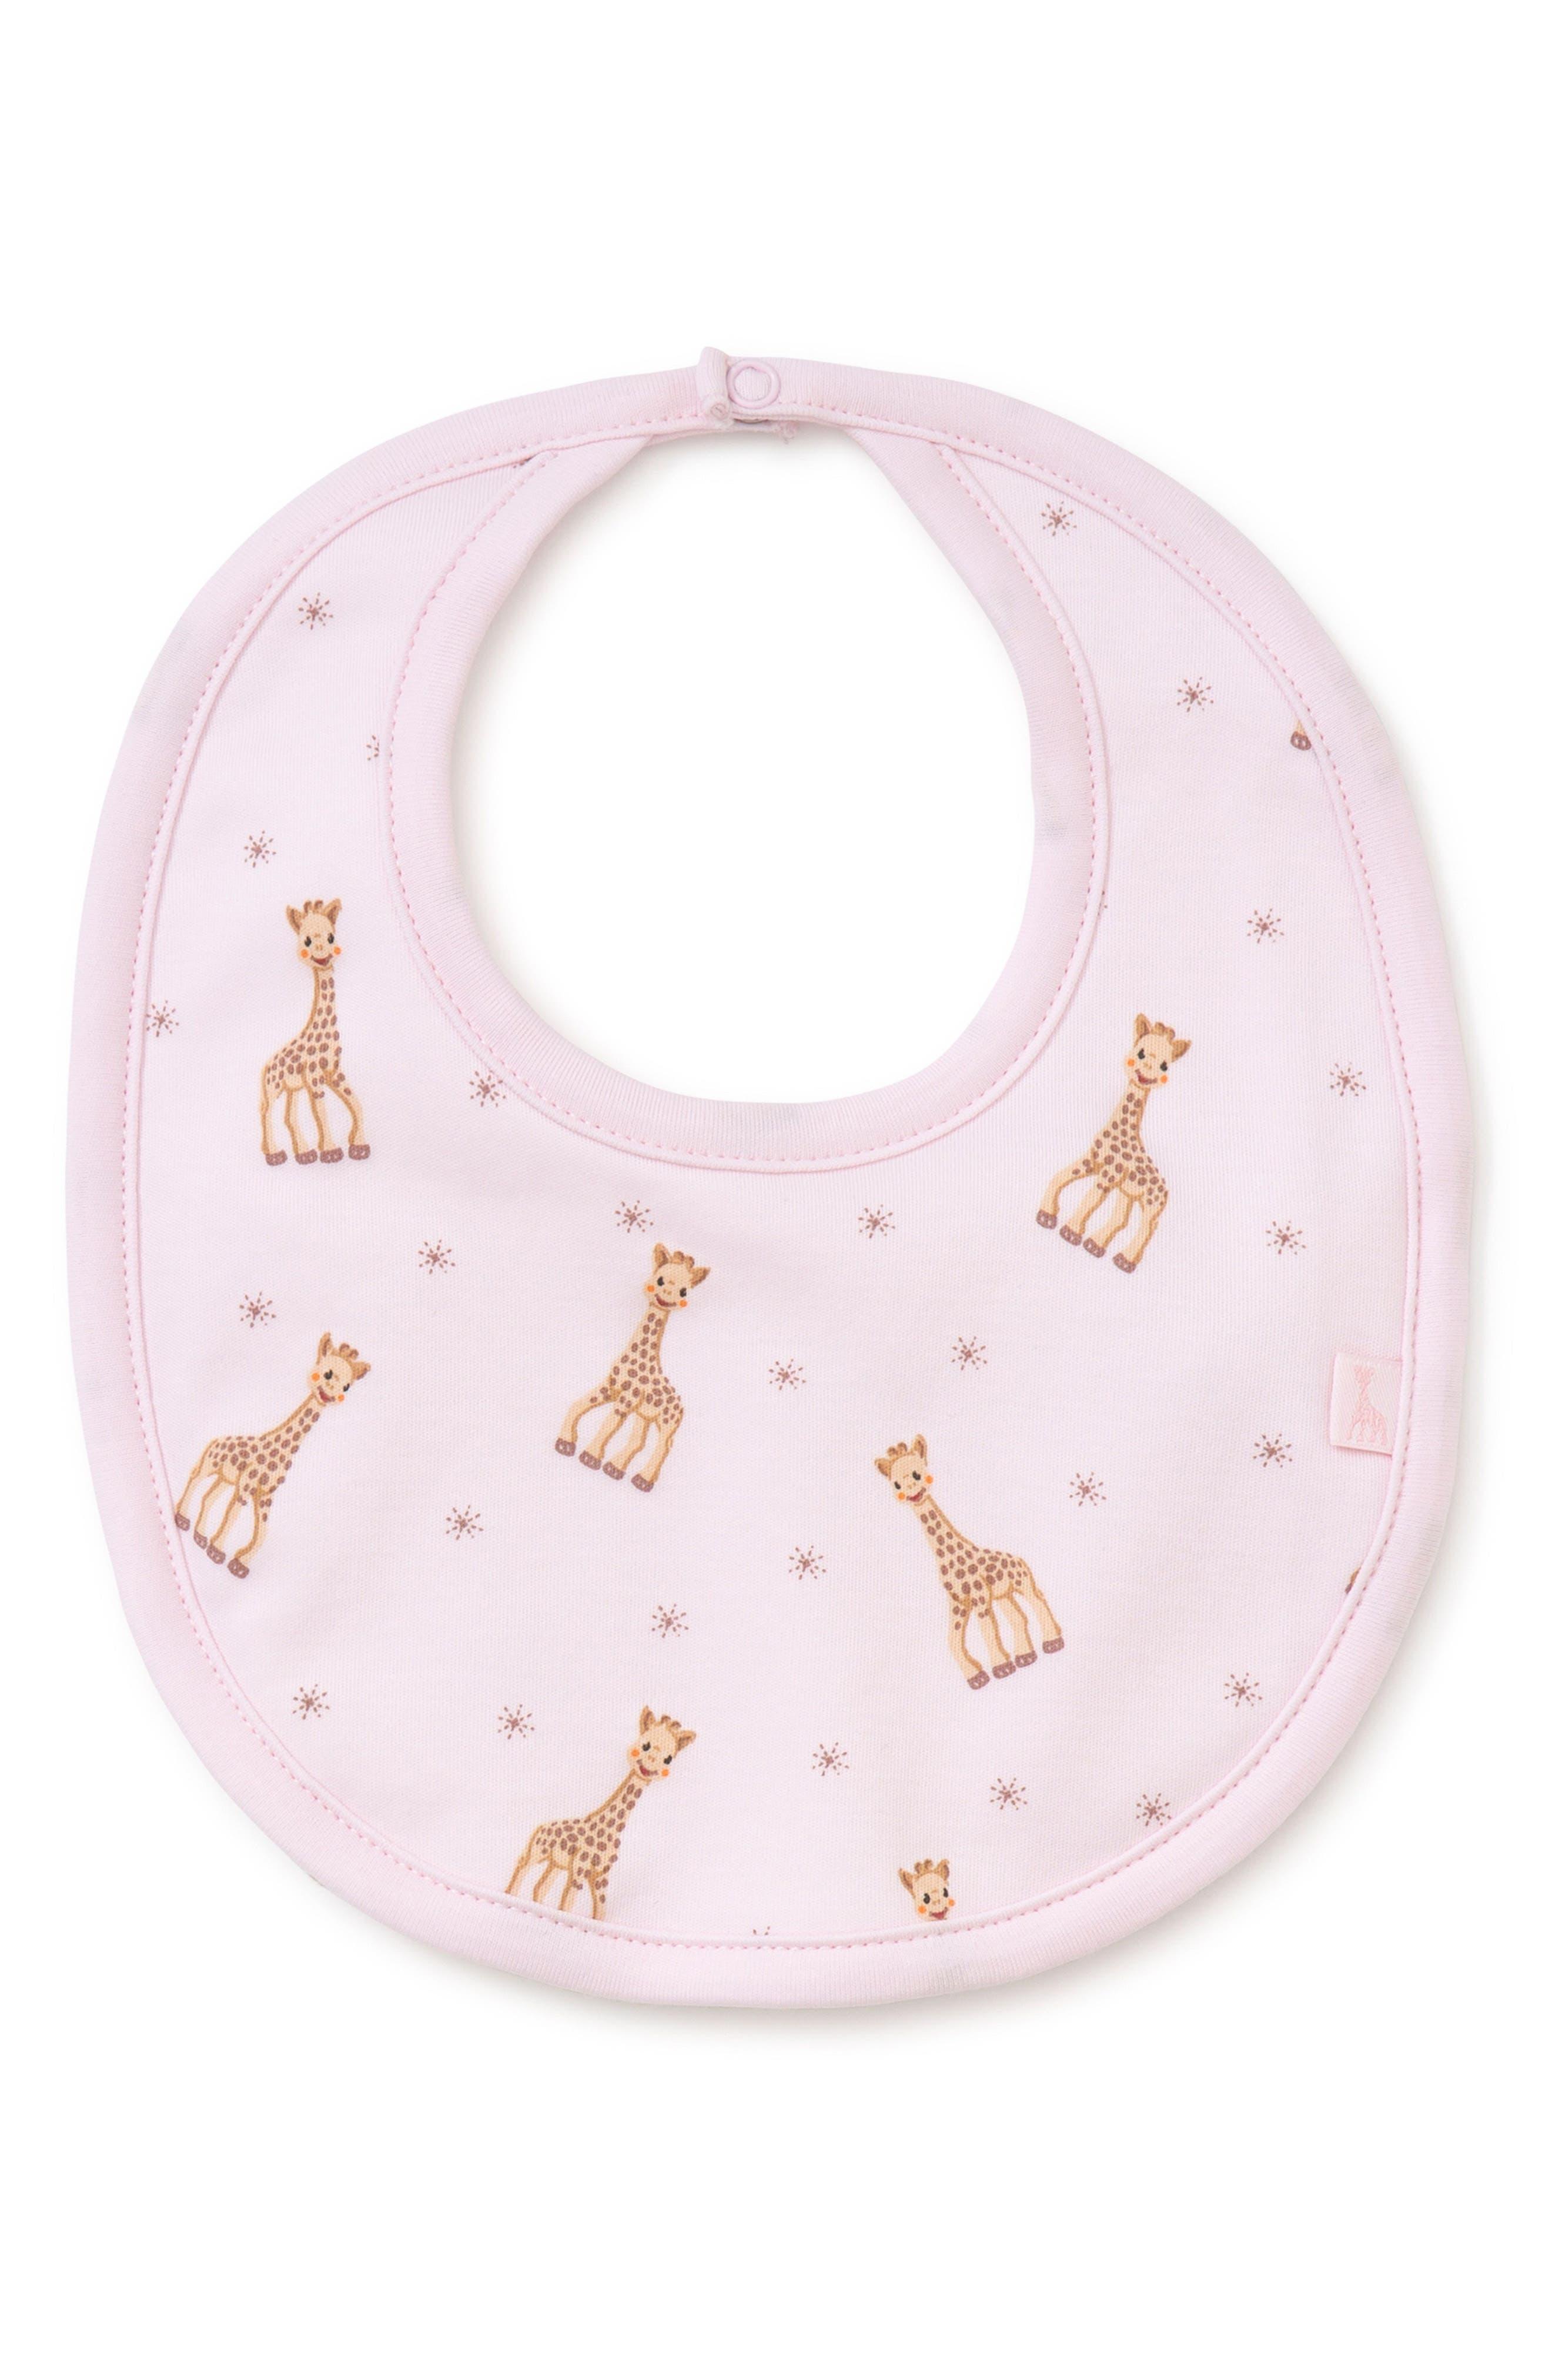 x Sophie la Girafe Bib,                         Main,                         color, Pink